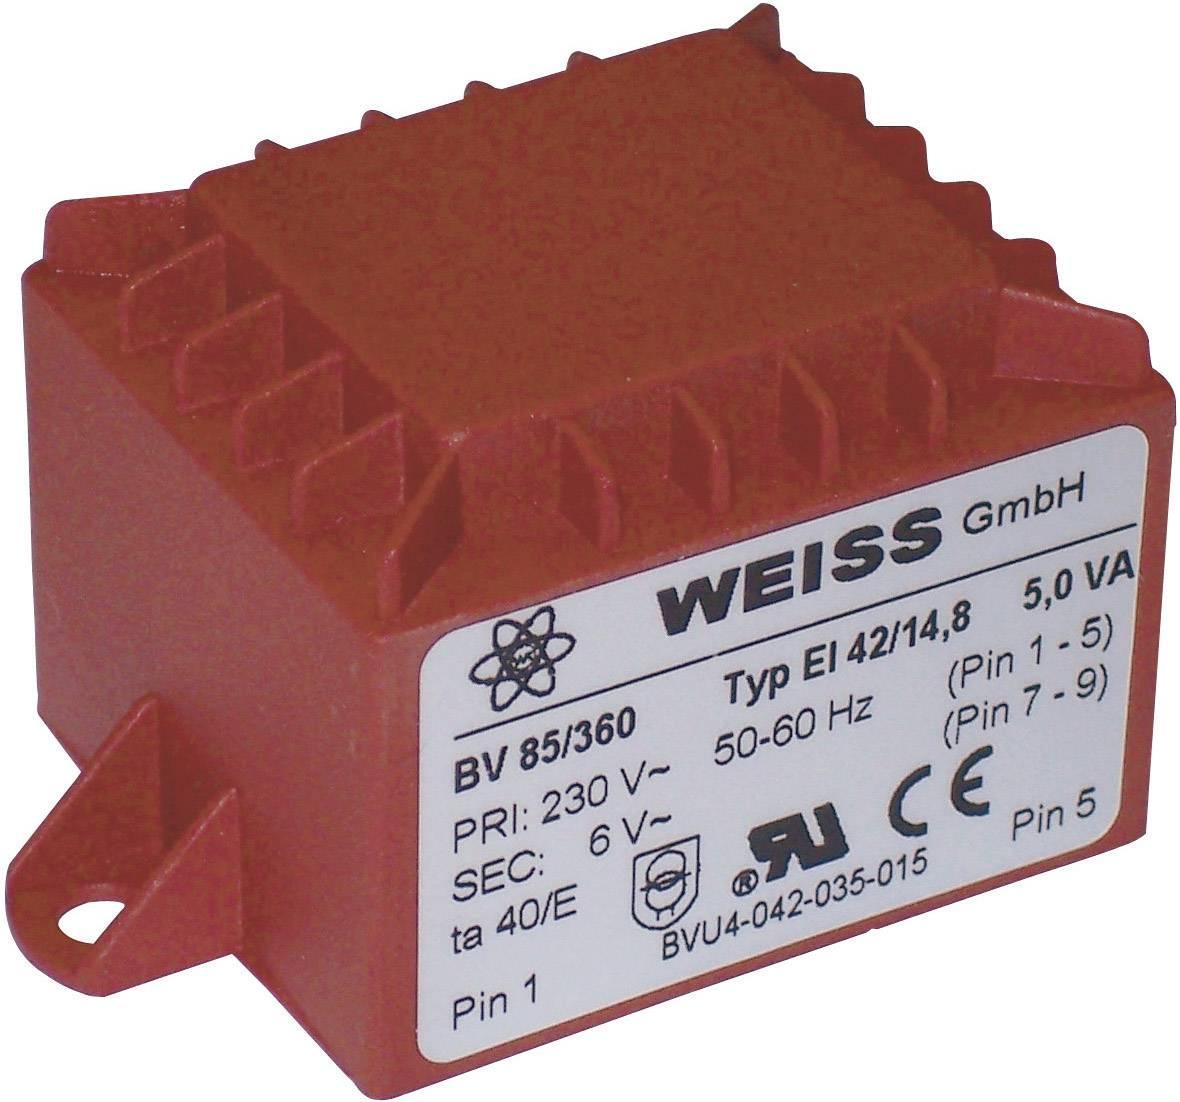 pcb mount transformer 1 x 230 v 1 x 9 v ac 5 va 556 ma from conrad Howl Moving Castle Pins pcb mount transformer 1 x 230 v 1 x 9 v ac 5 va 556 ma